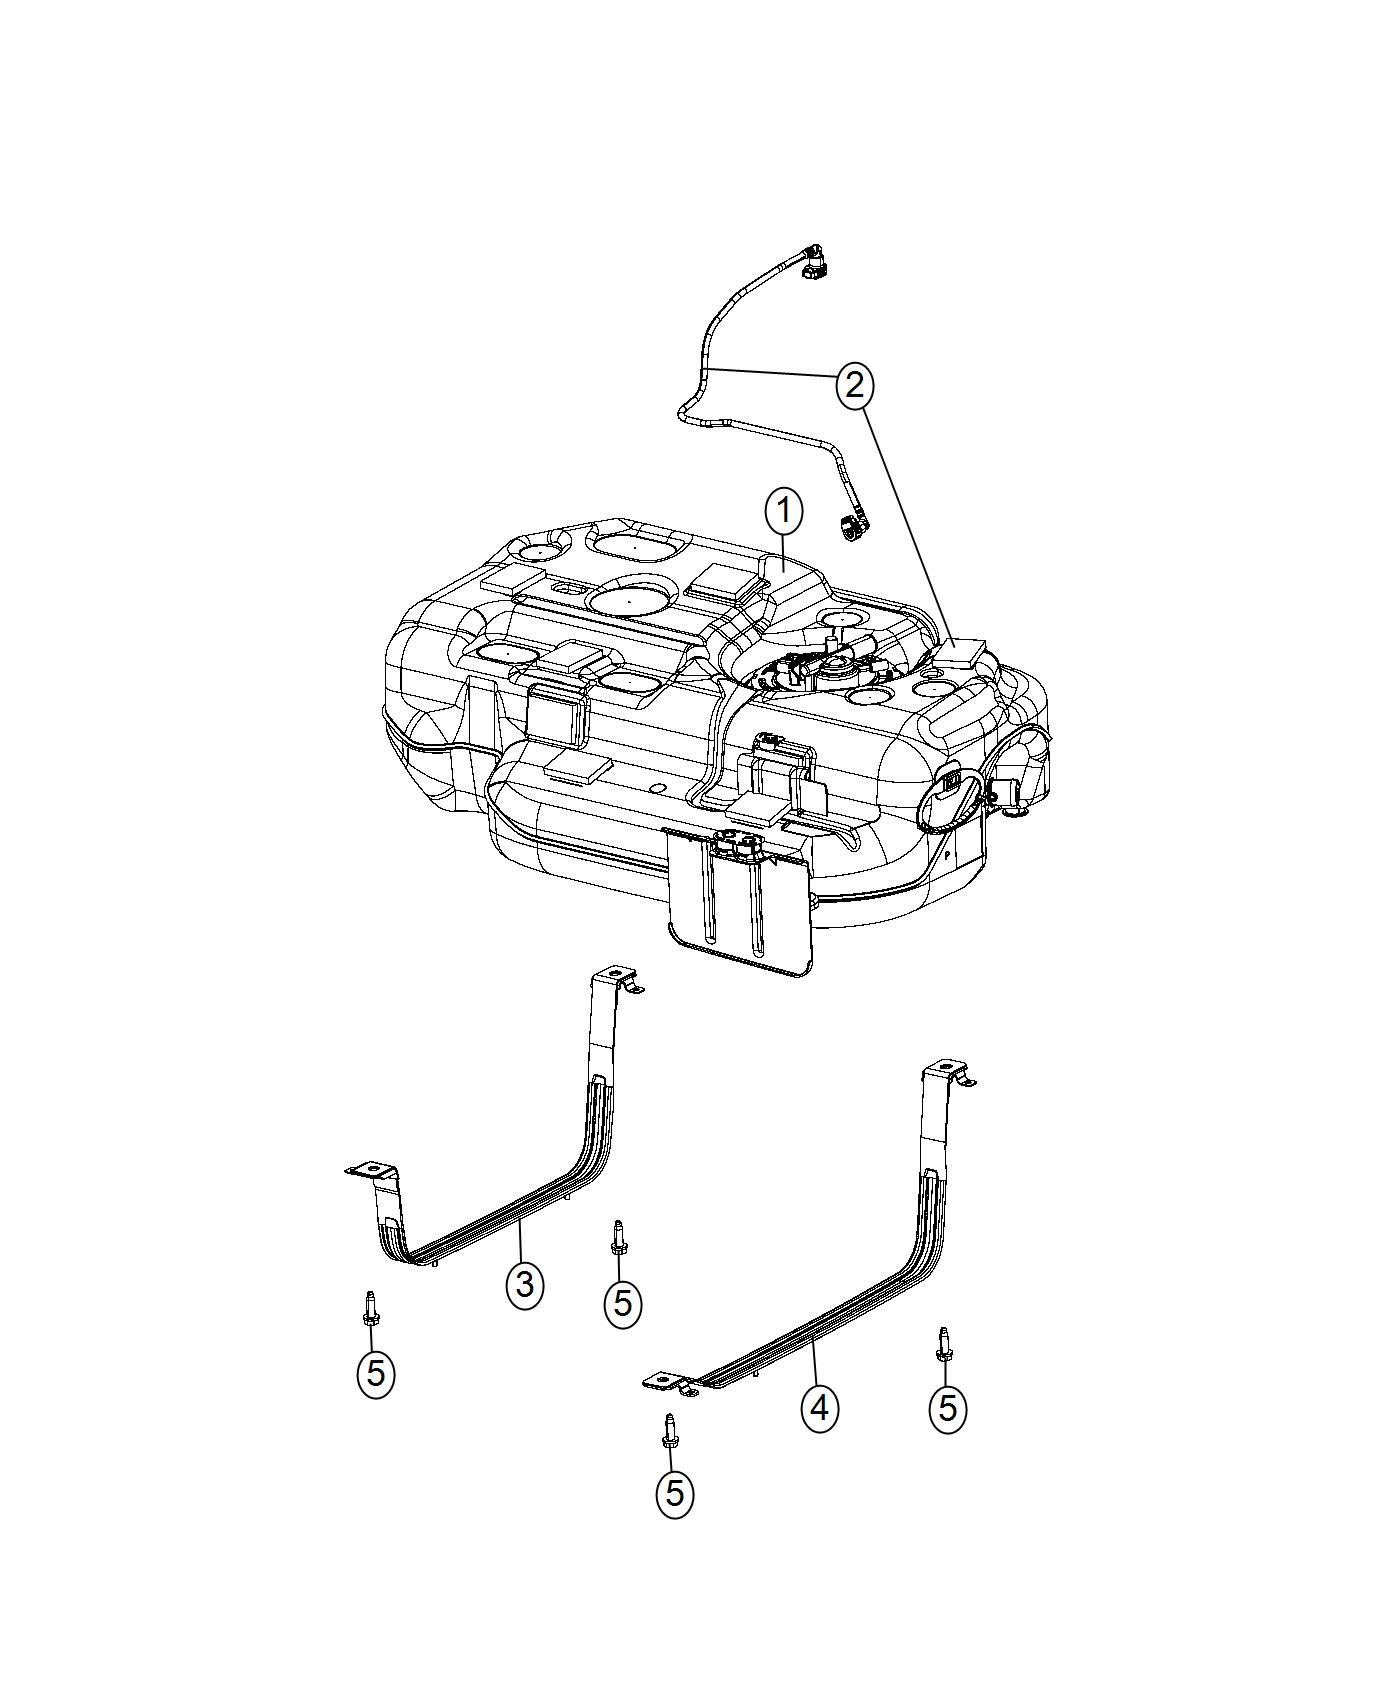 2017 Chrysler Pacifica Tank. Fuel. [19 gallon fuel tank